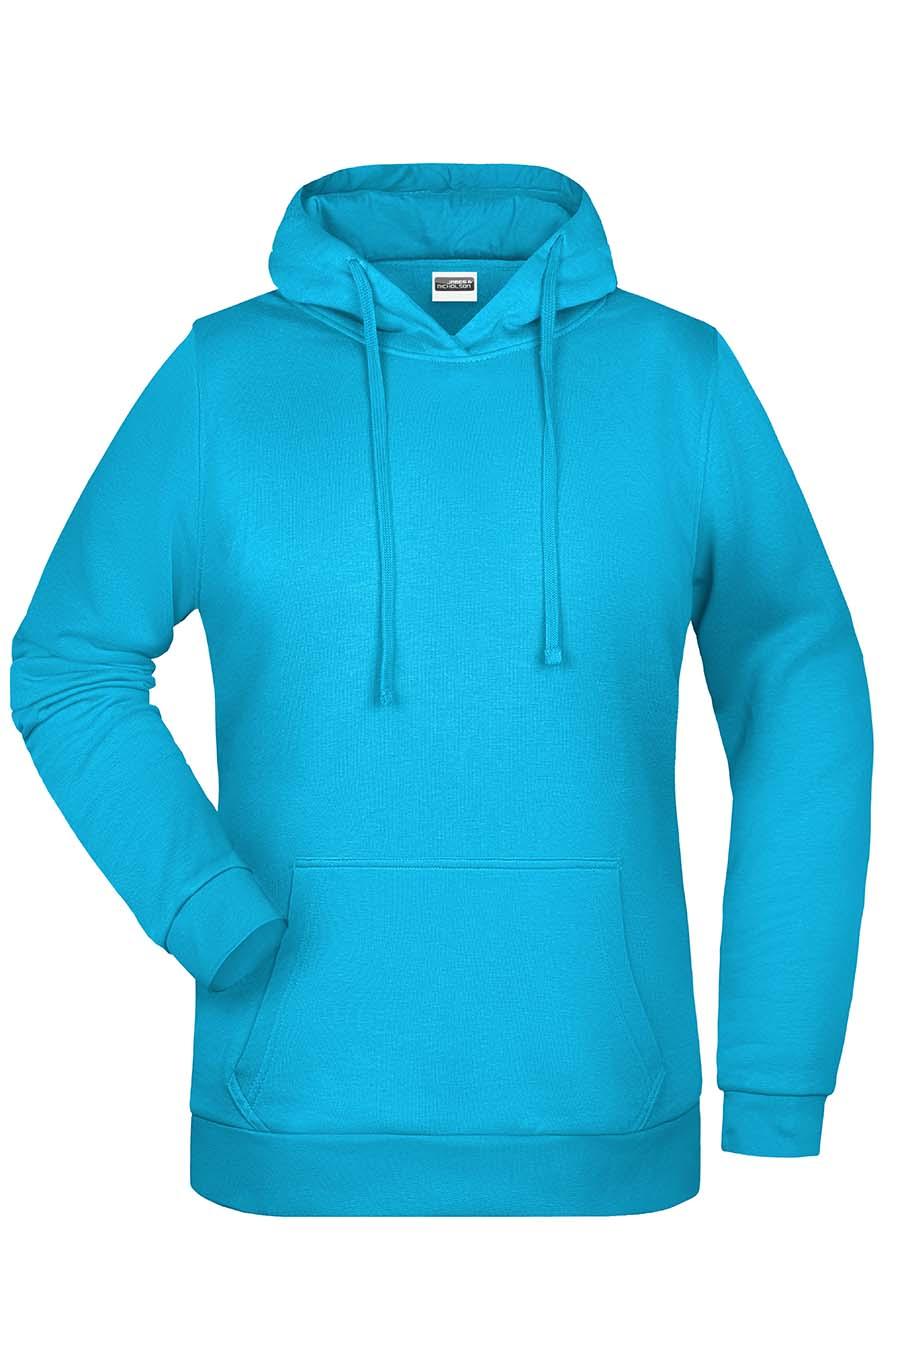 Sweat-shirt capuche femme - 20-1494-21